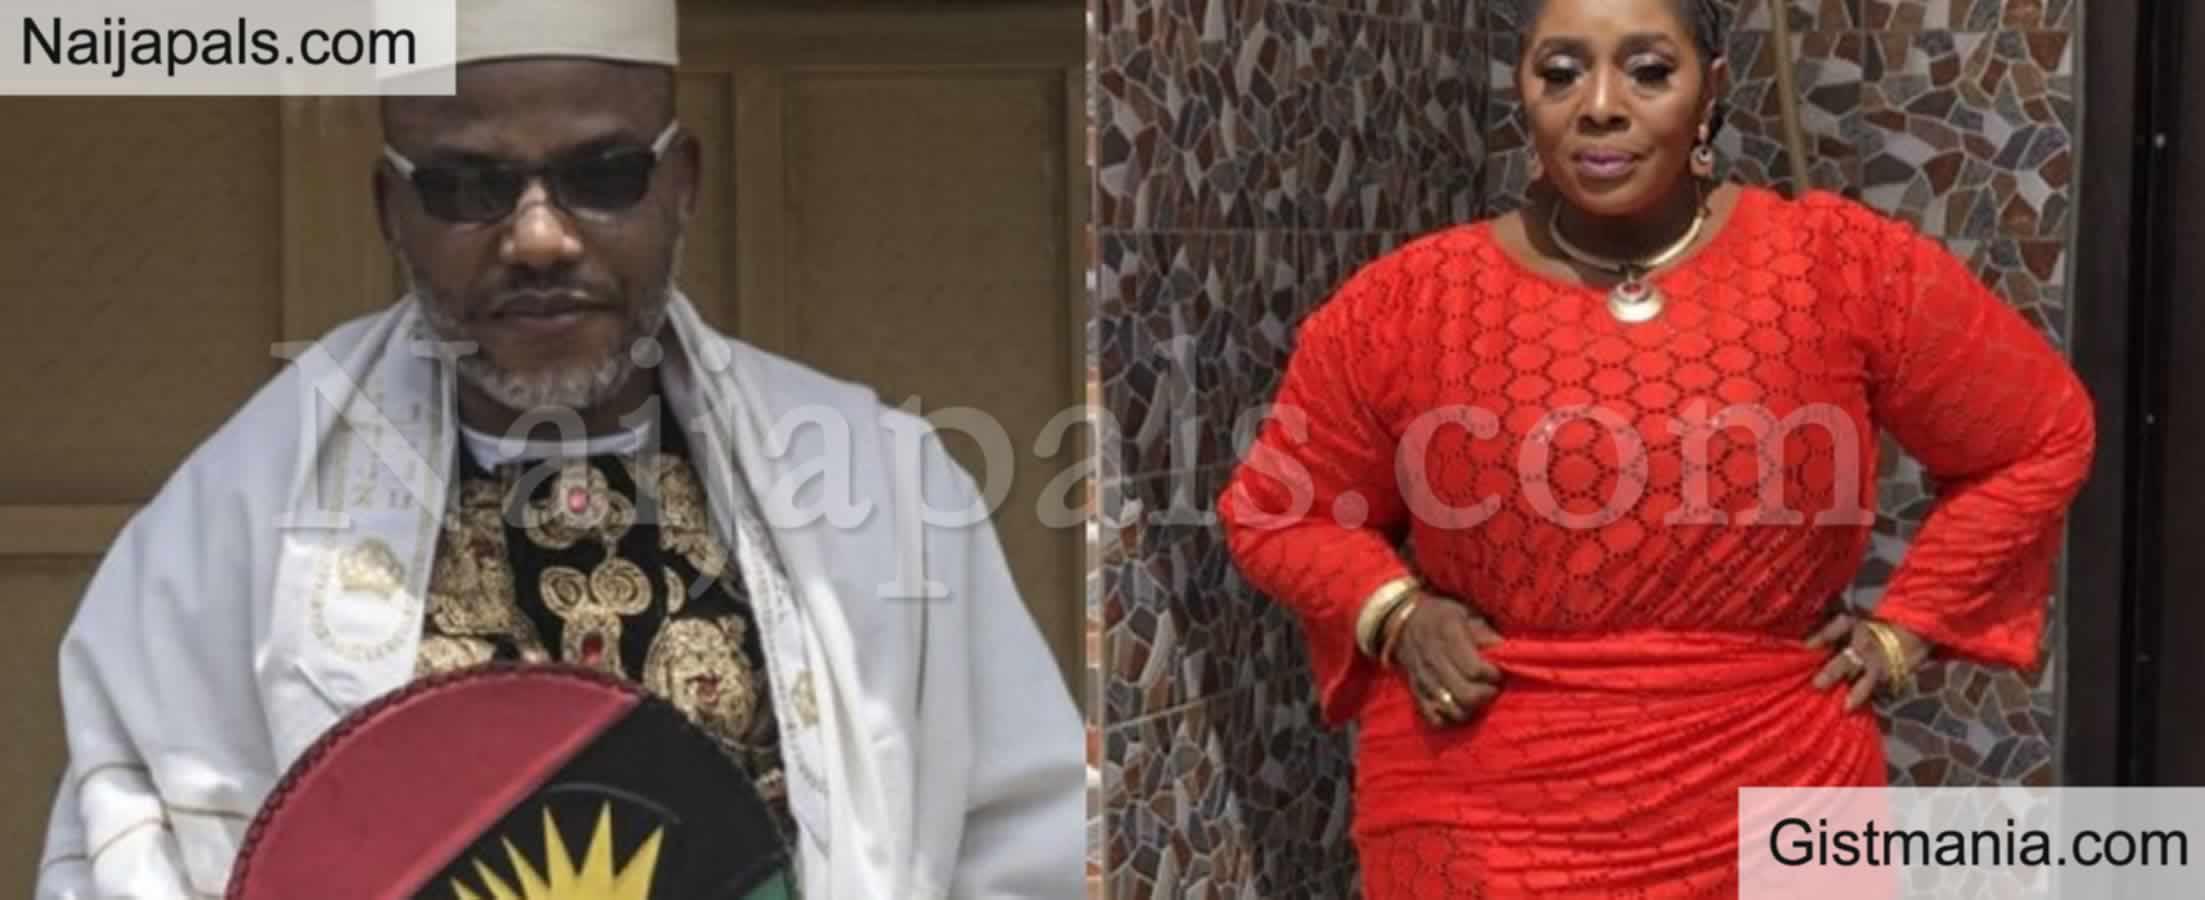 <img alt='.' class='lazyload' data-src='https://img.gistmania.com/emot/comment.gif' /> <b>Free Nnamdi Kanu Now to Avoid Had I Known</b> - Actress Rita Edochie Warns Buhari